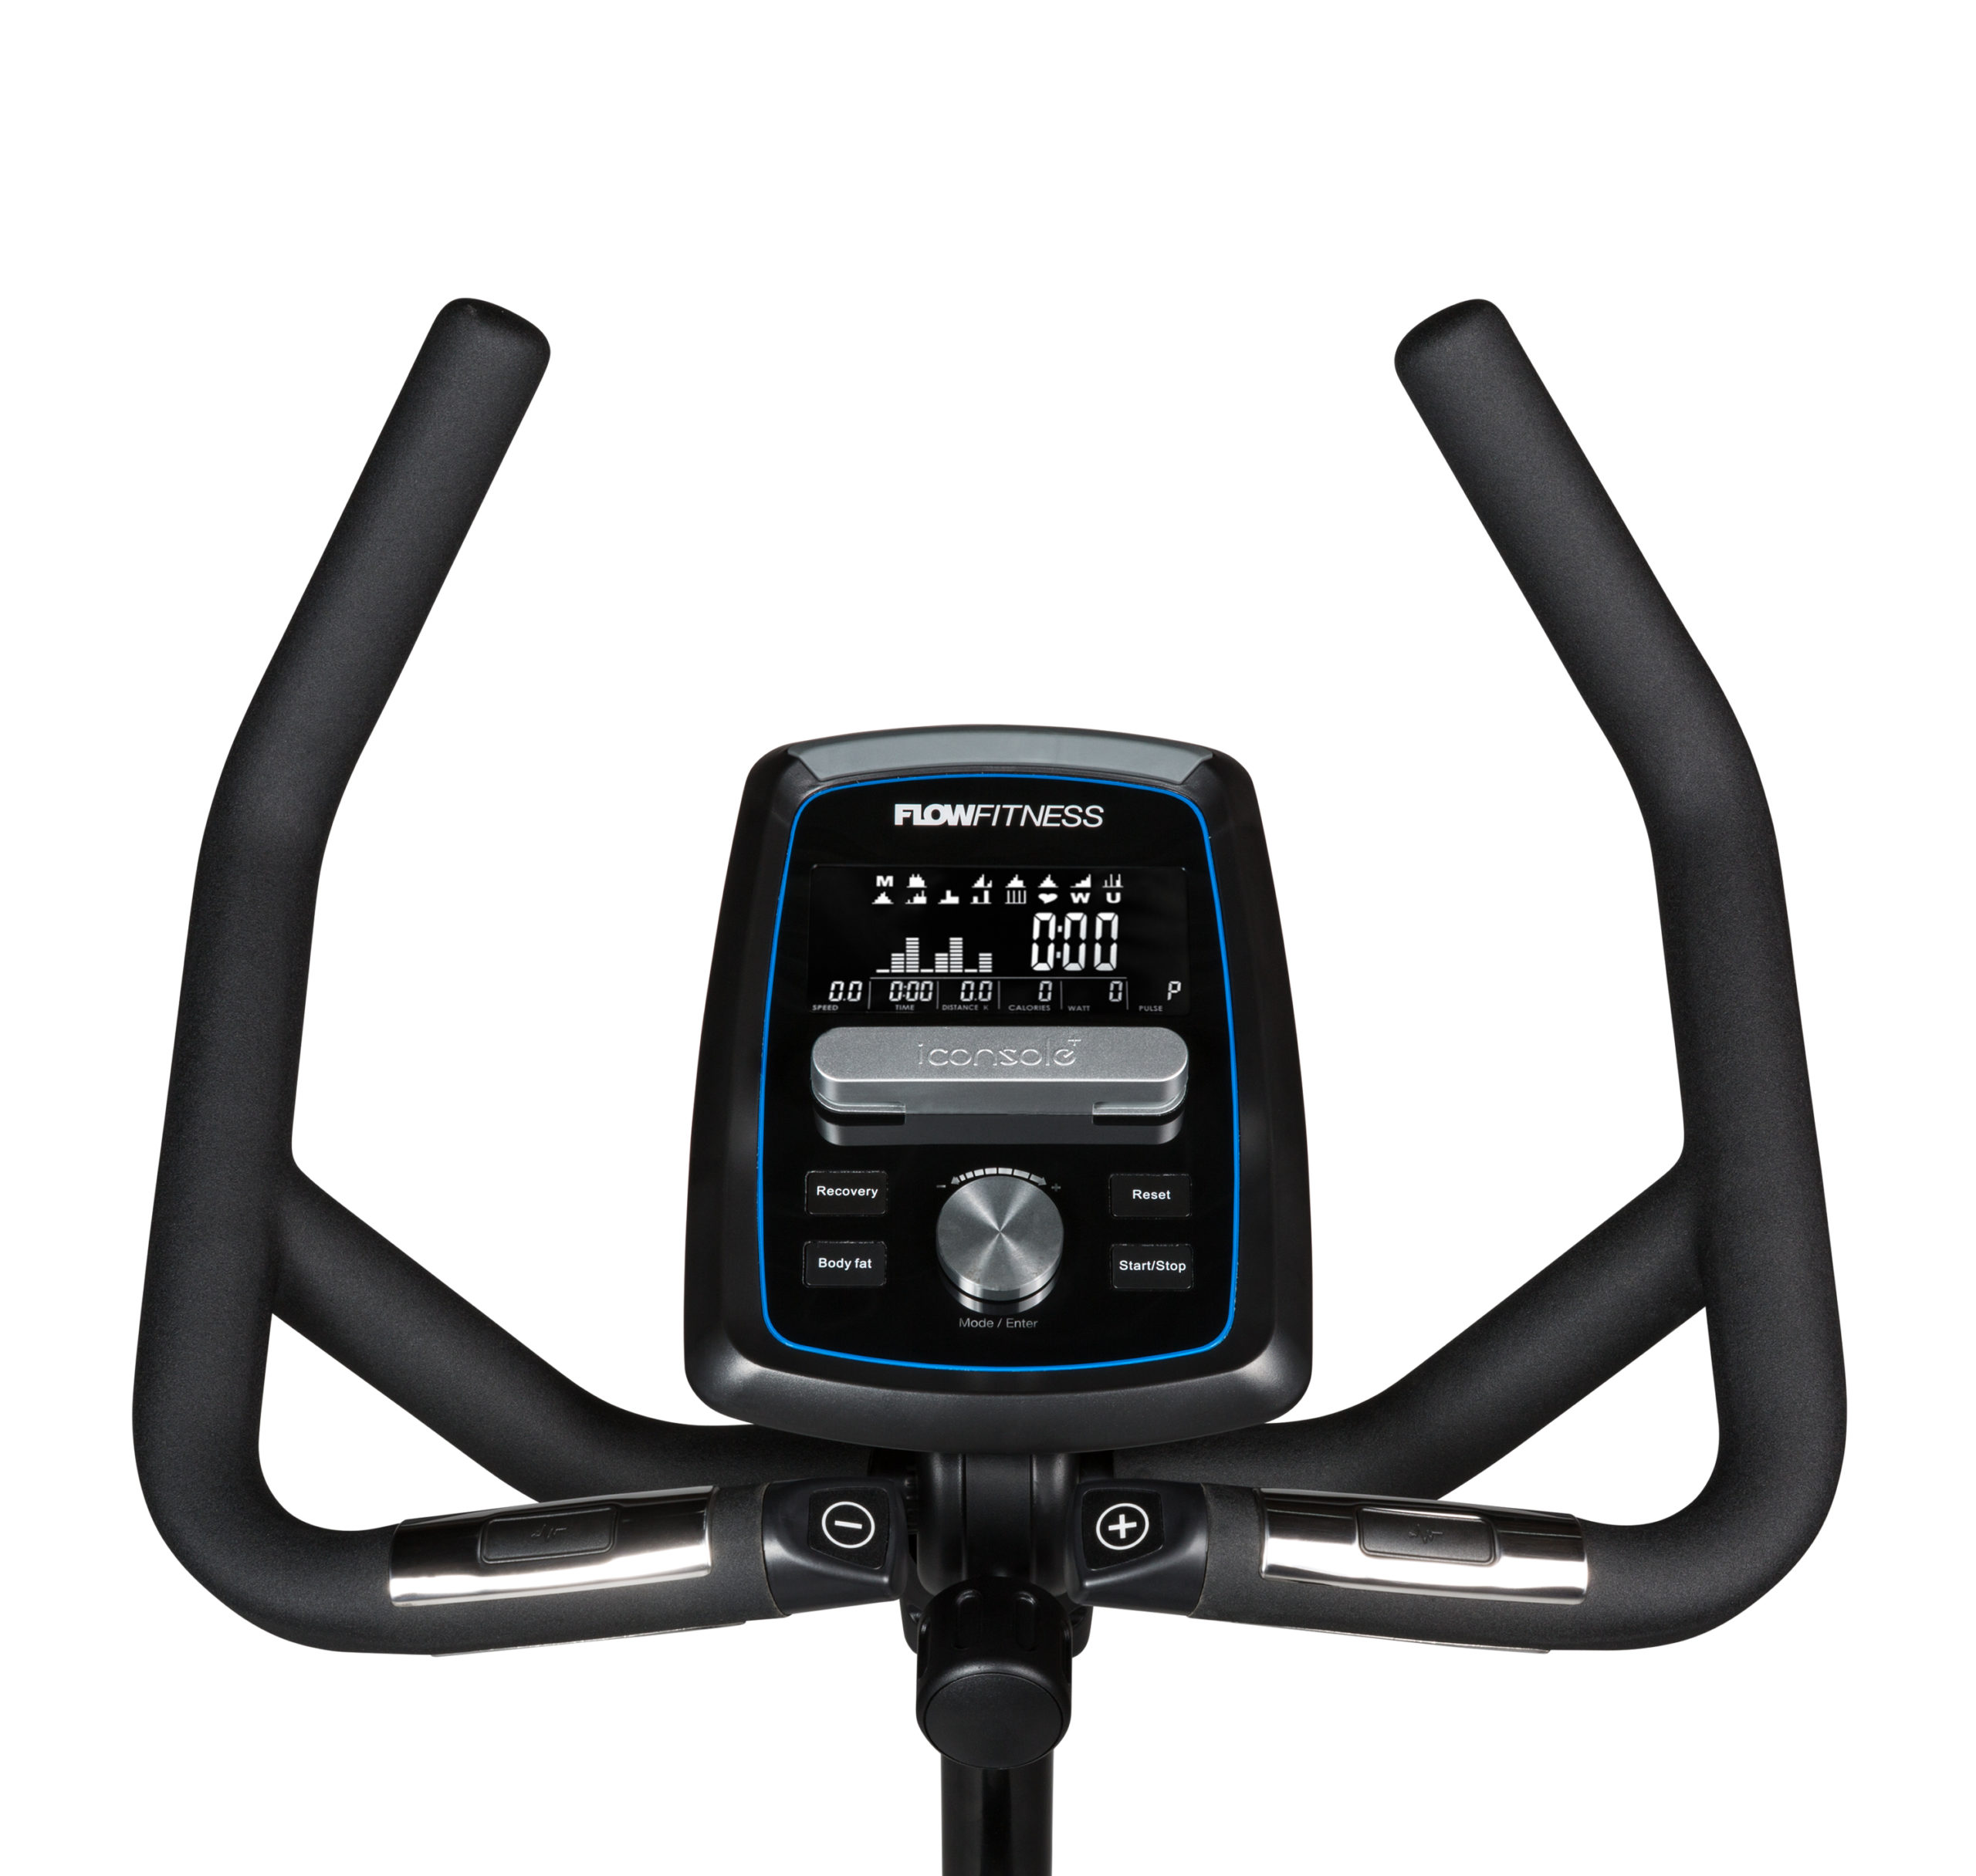 Flow Fitness Tabel PERFORM B2i Ergometer 6